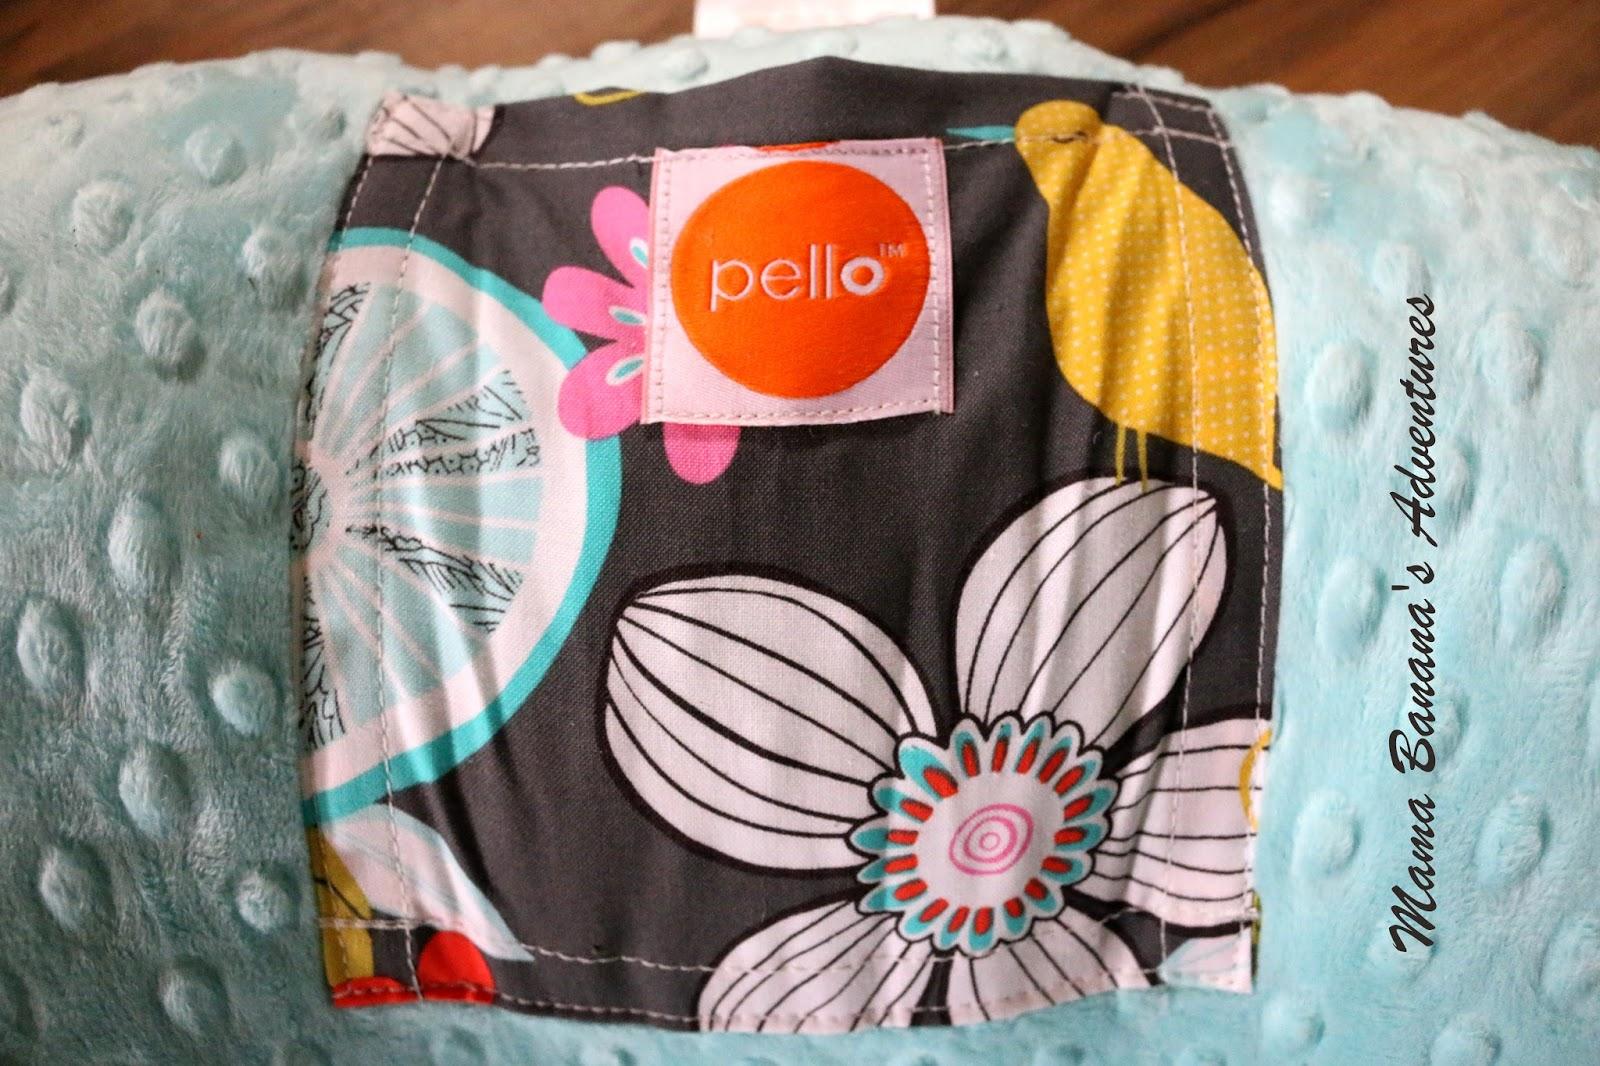 Pello Baby Pillow Mama Banana S Adventures